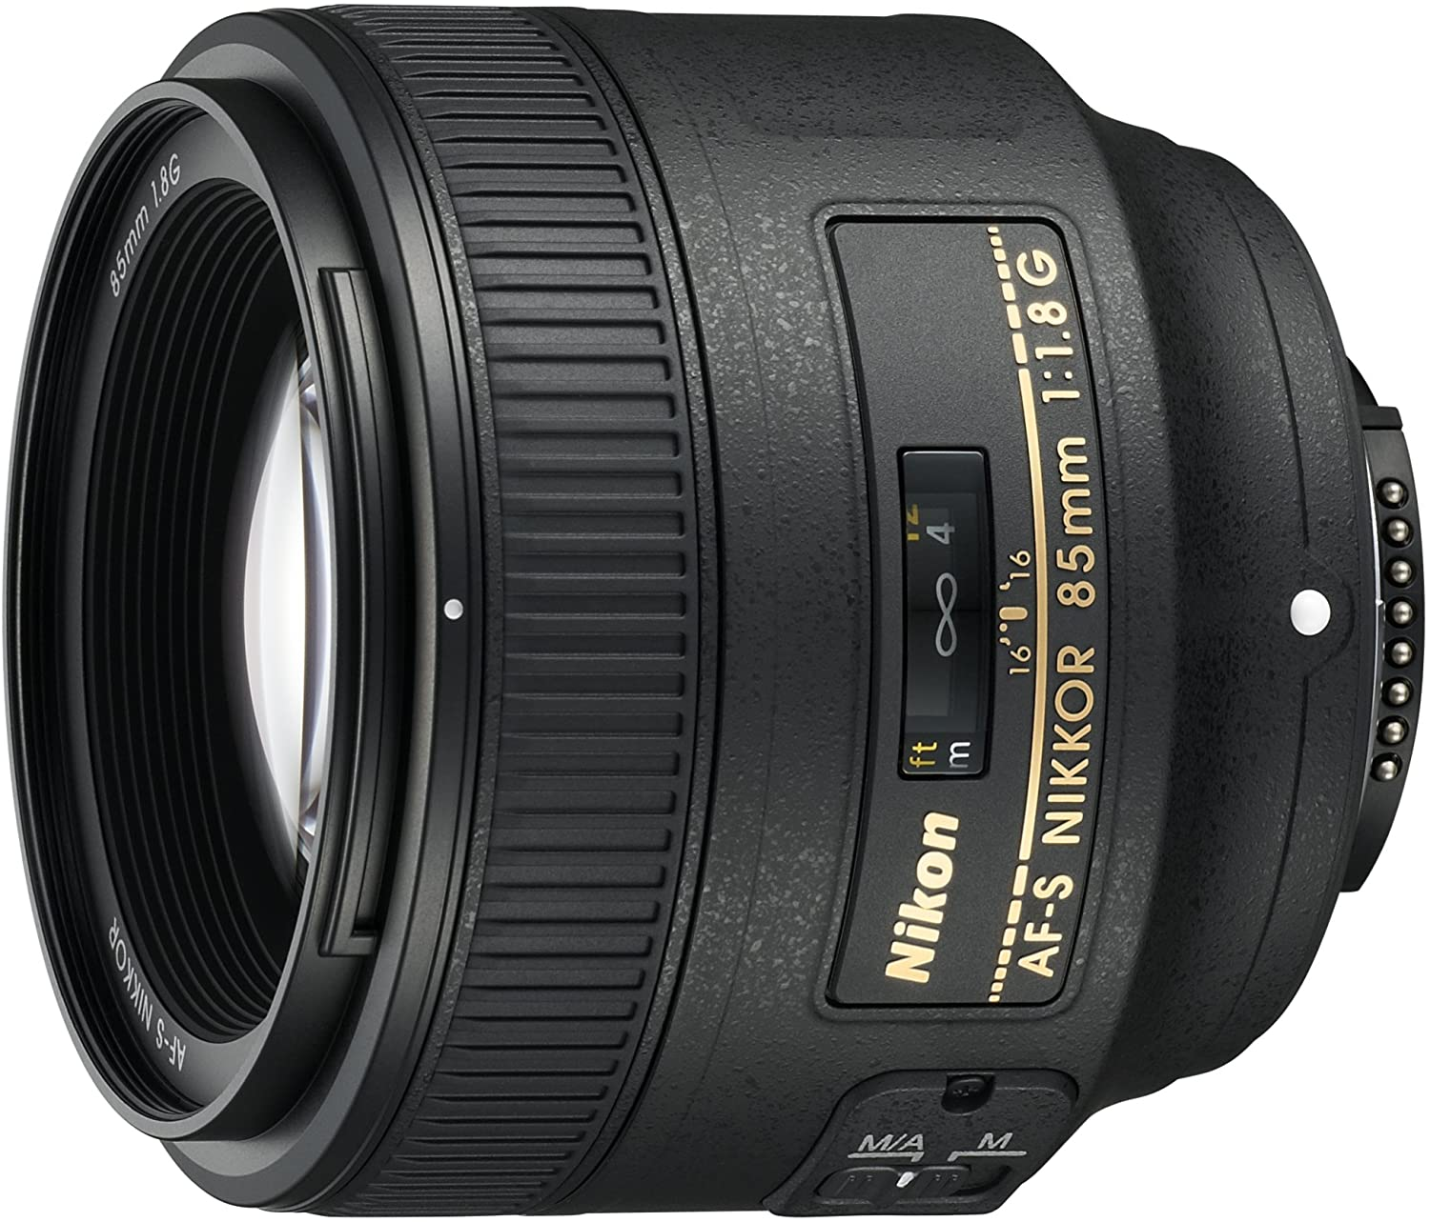 Best Wedding Photography Lens for Nikon D5600